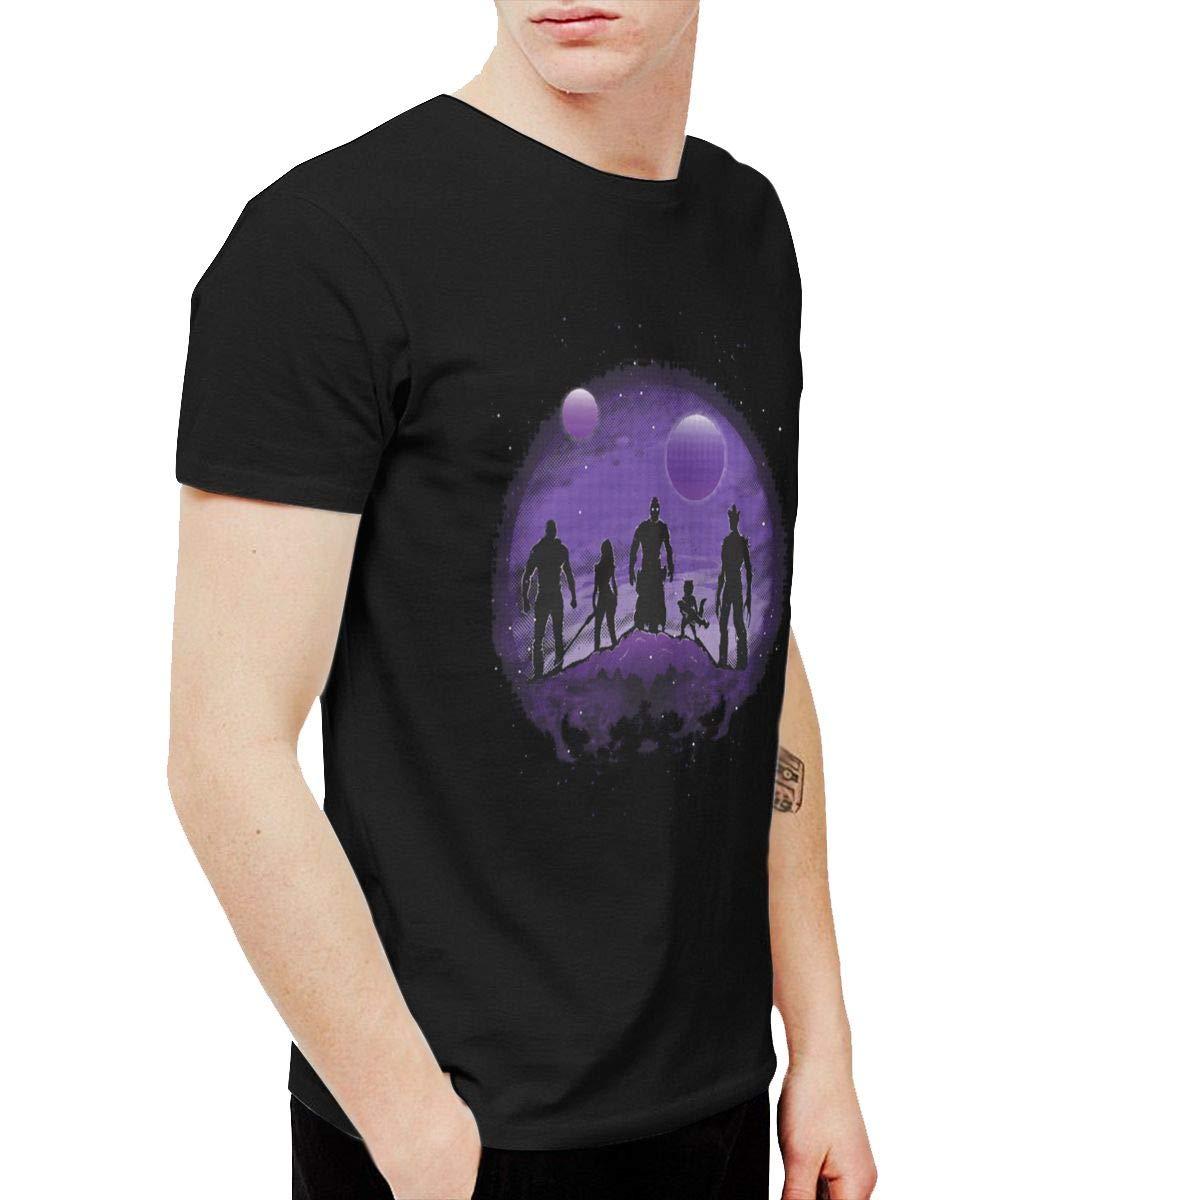 Twocjlrq Guardians Leisure Black Shirts